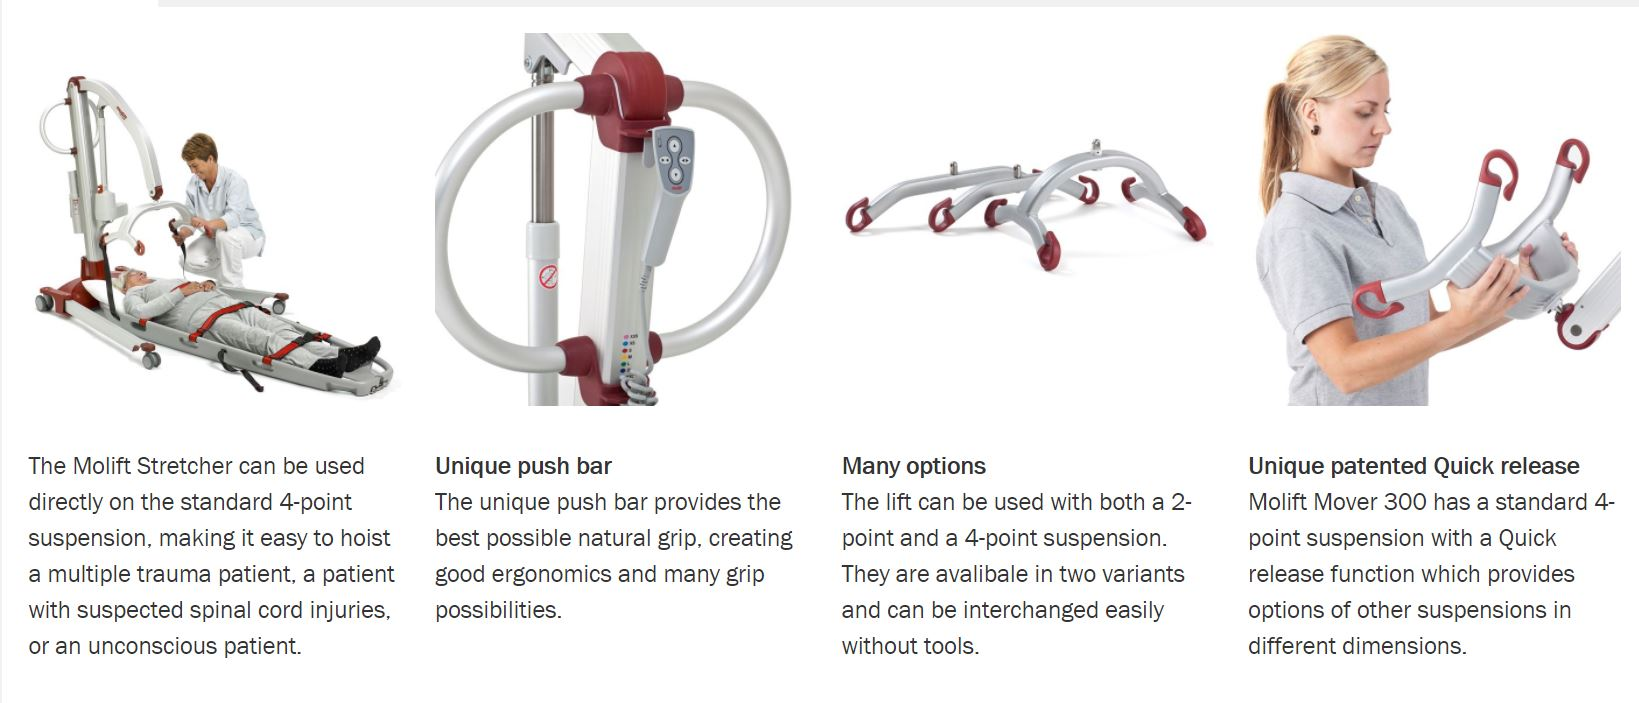 molift-205-patient-lift.jpg